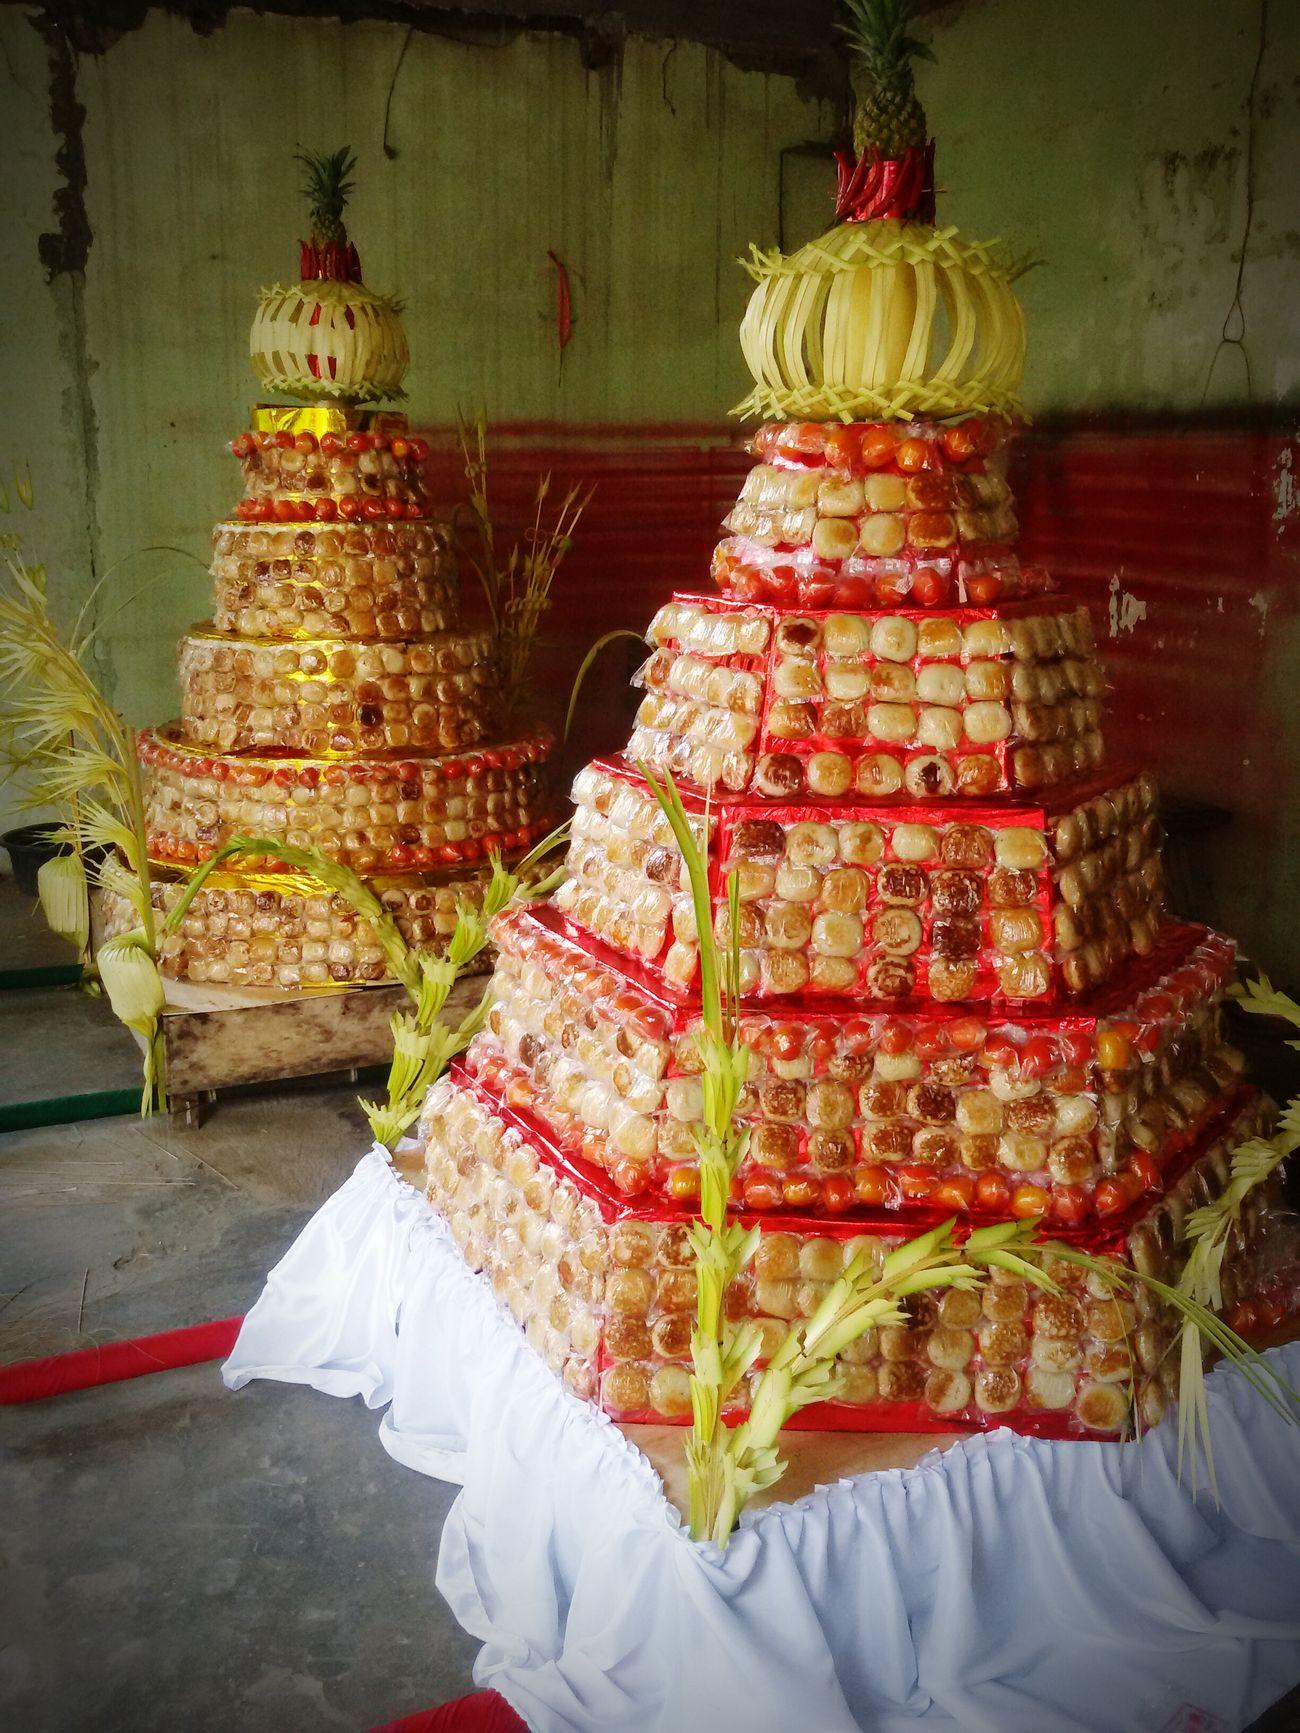 gunungan apem untuk upacara sebar apem yaqowiyu Tradisional Tradisi Upacara Kue Apem Exploreklaten Klaten, Jawa Tengah Indonesian Food